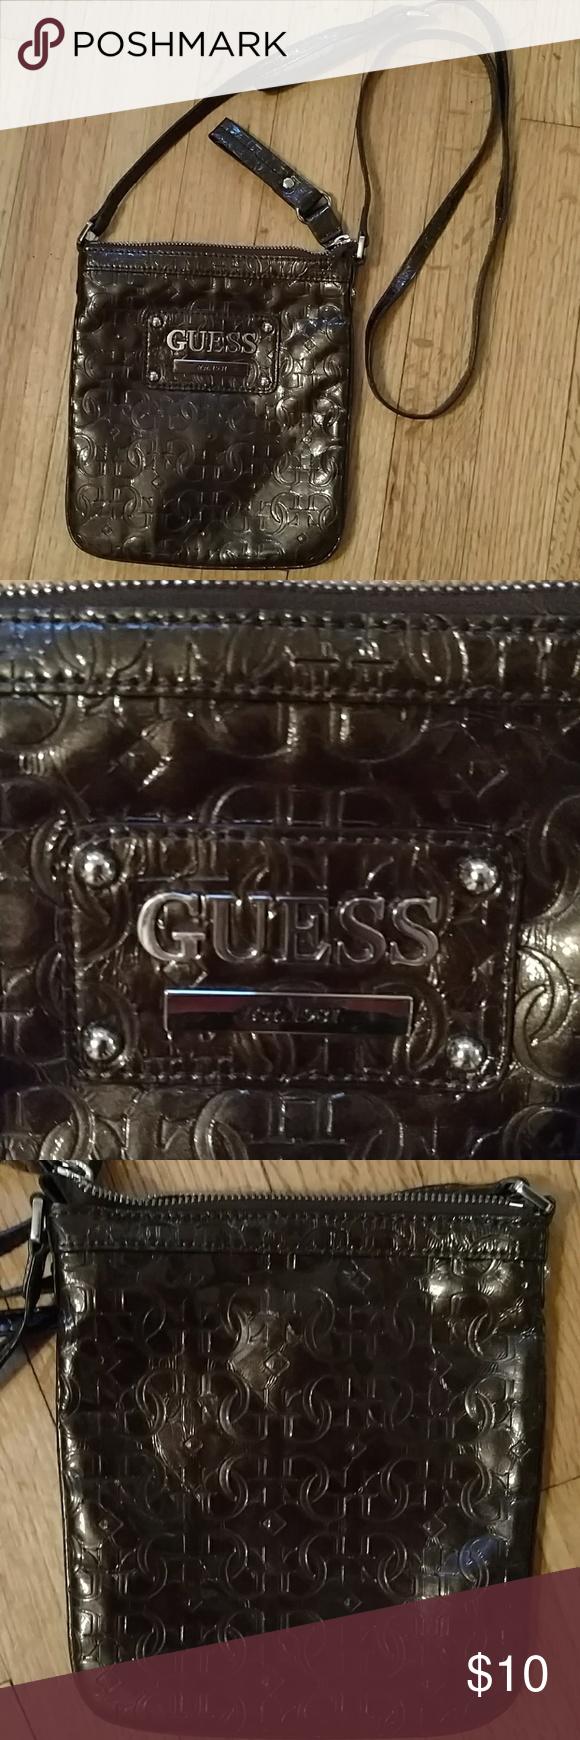 ... poshmark fashion shopping  Guess bag Guess bags, Chocolate brown and  Crossbody bags quality design c77aa 6b17e ... 06769f59fc